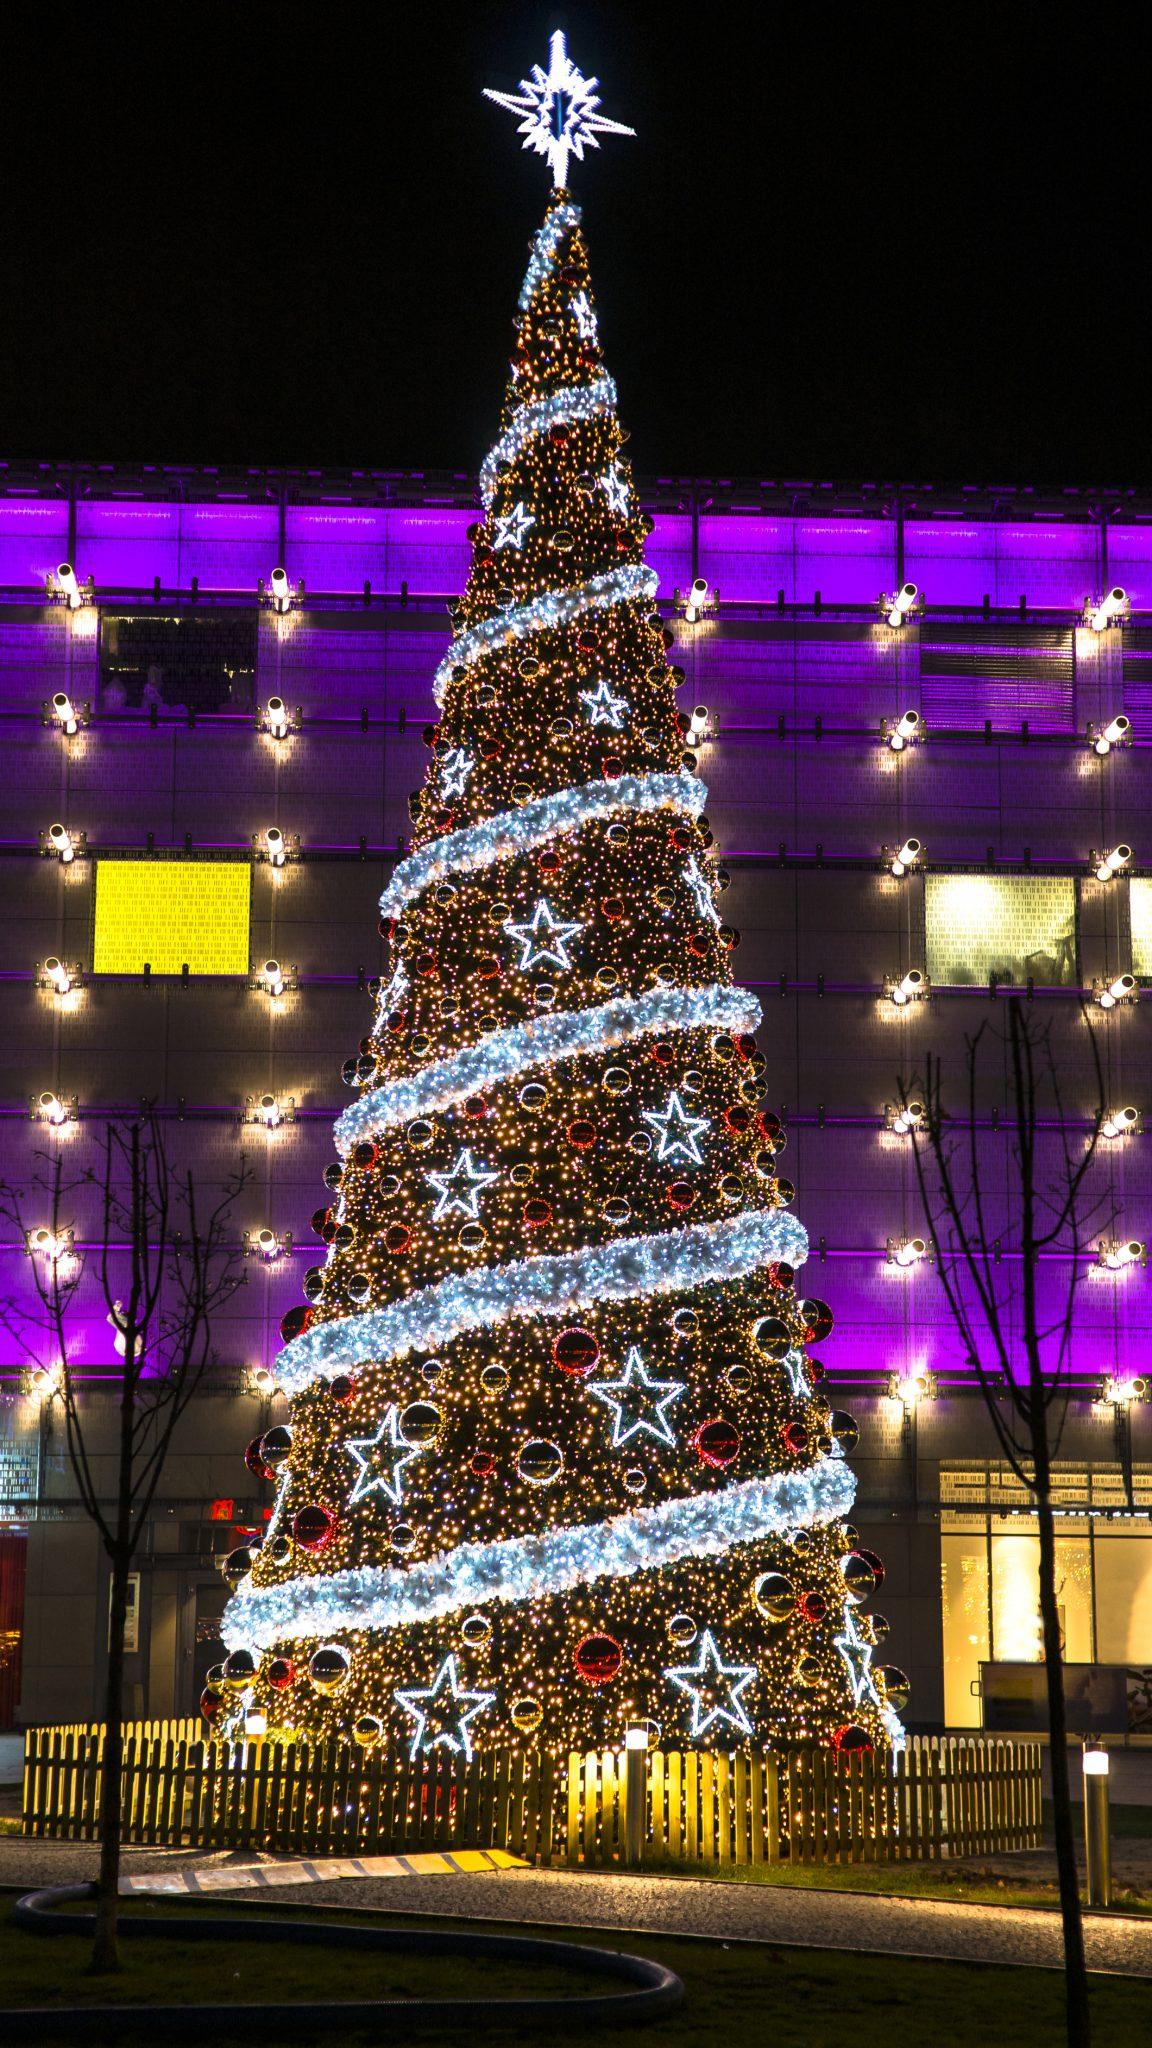 Bespoke Christmas tree lighting in the UK